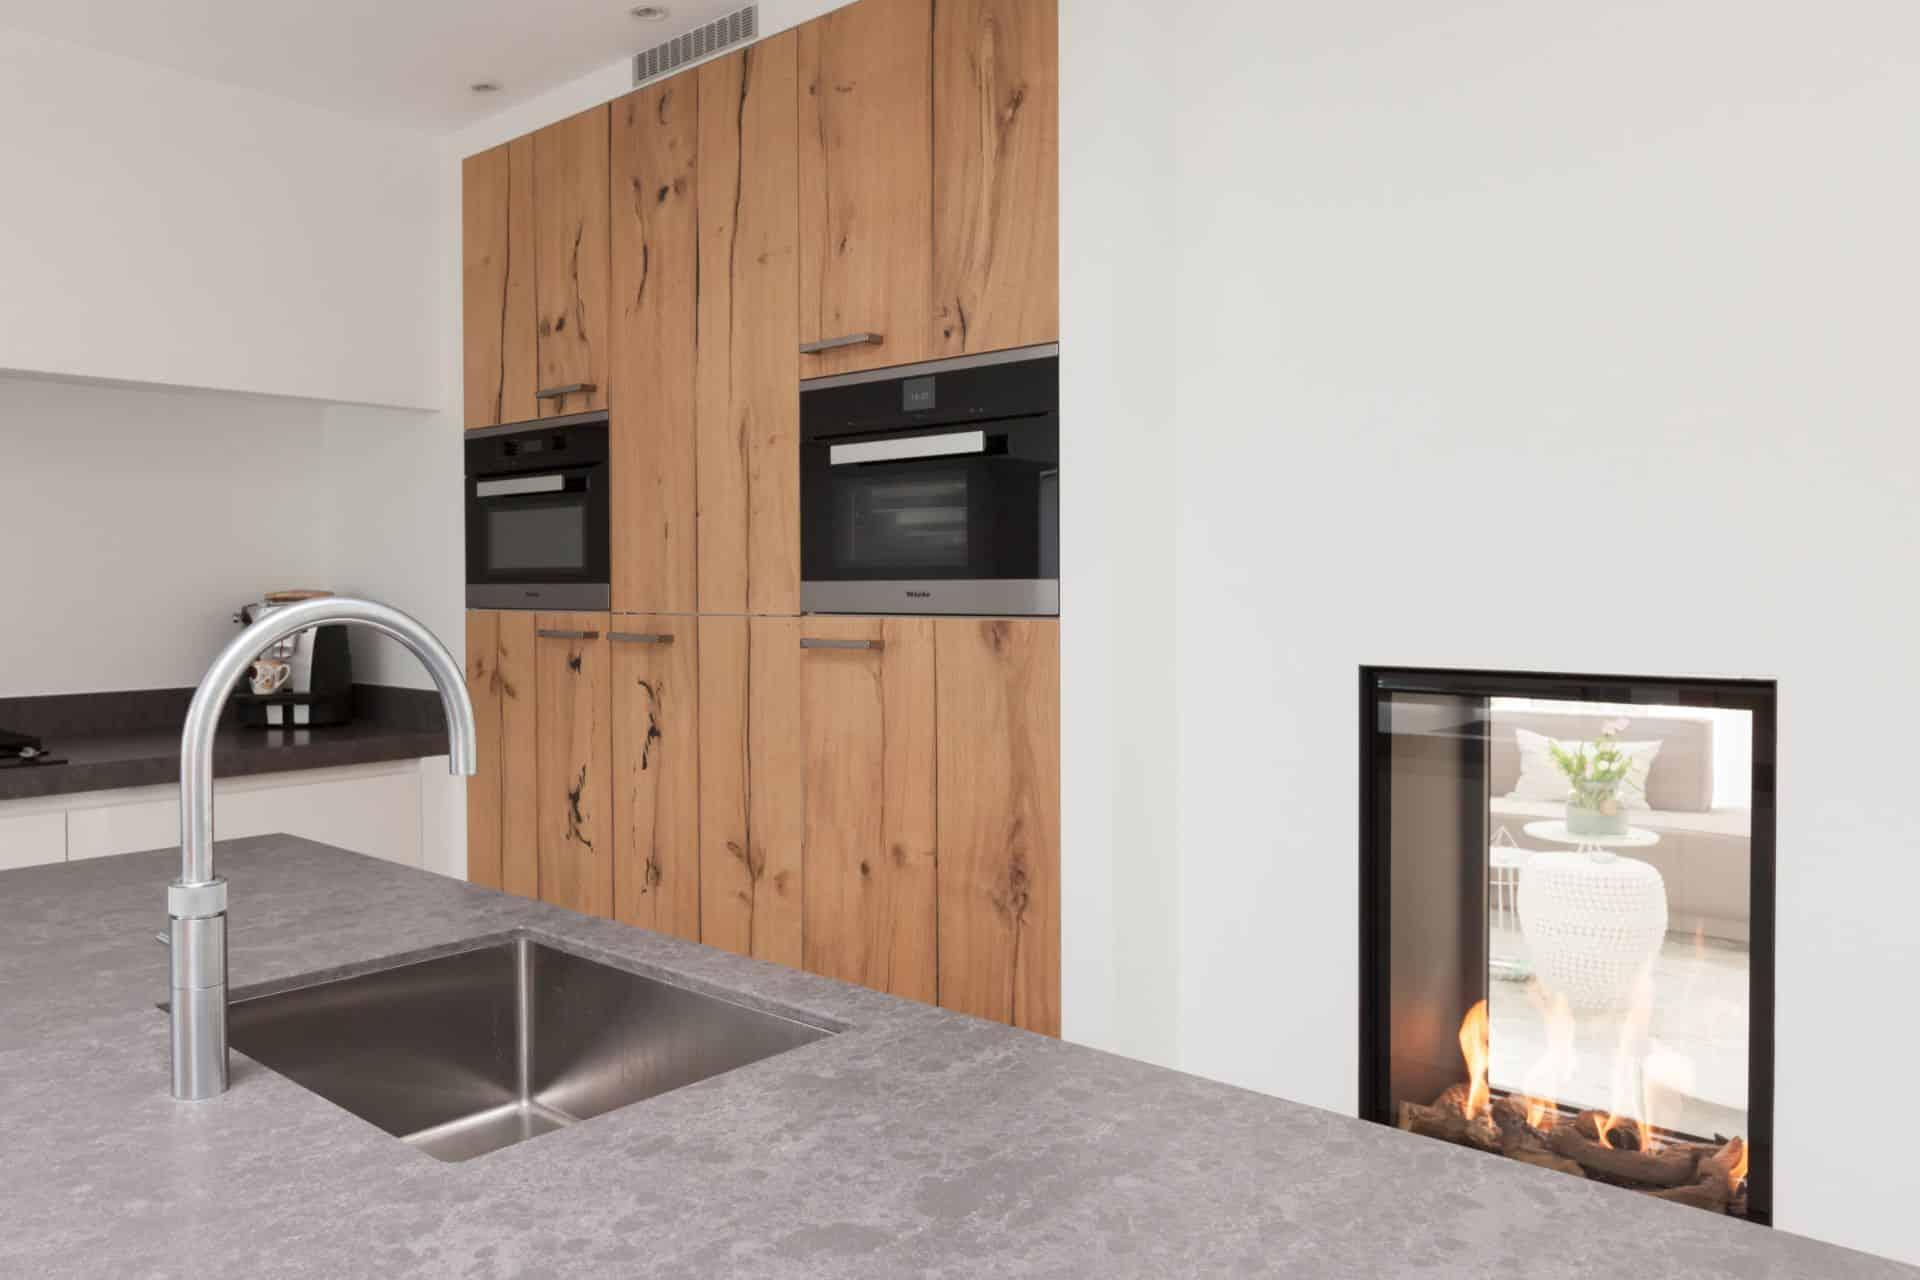 Moderne witte keuken met Quooker en Miele apparatuur | Barneveld